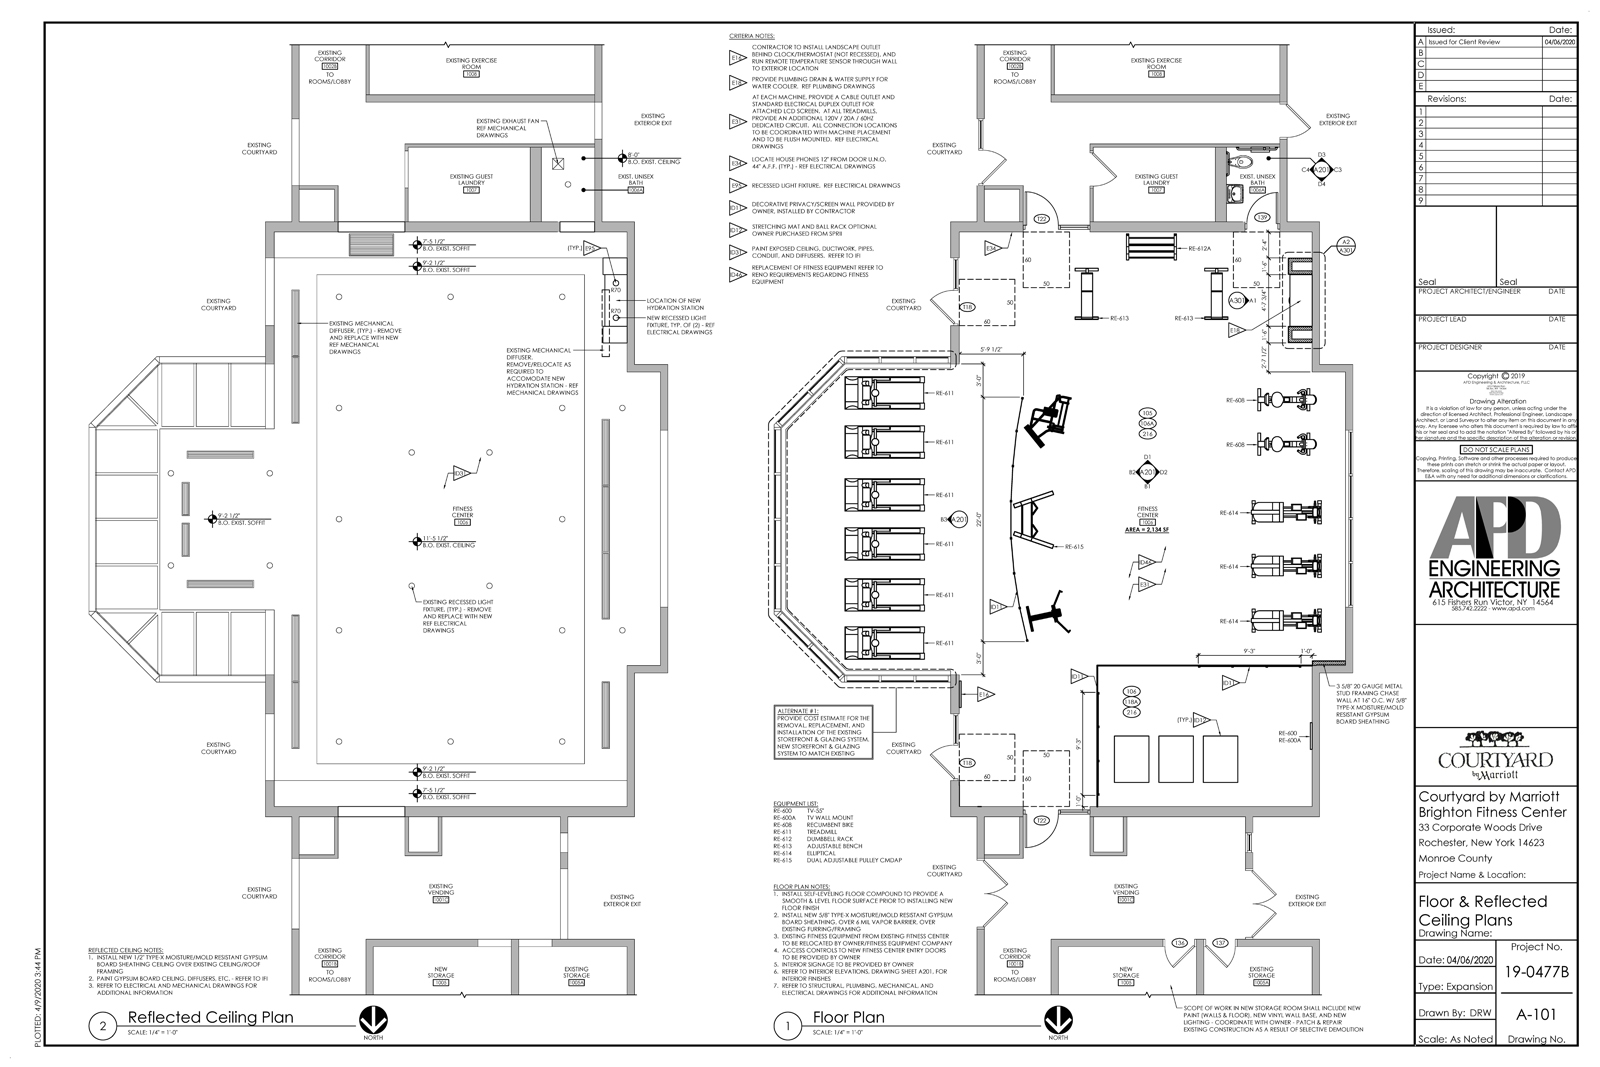 marriott-fitness-center-plan.jpg